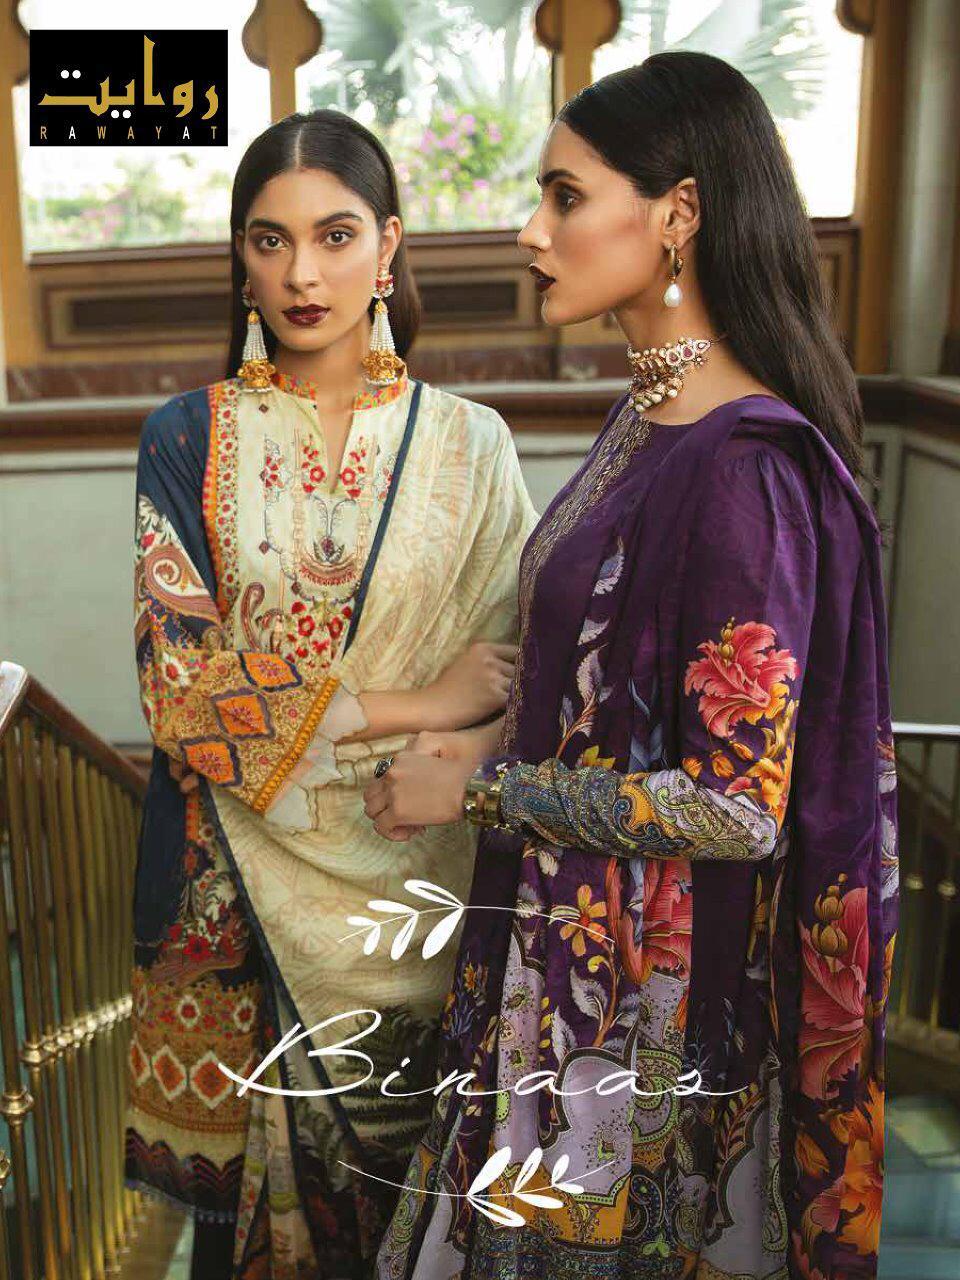 Rawayat Binaas Luxury Lawn Collection Jam Digital Print Embroidery Semi Stich Pakistani Test Suit